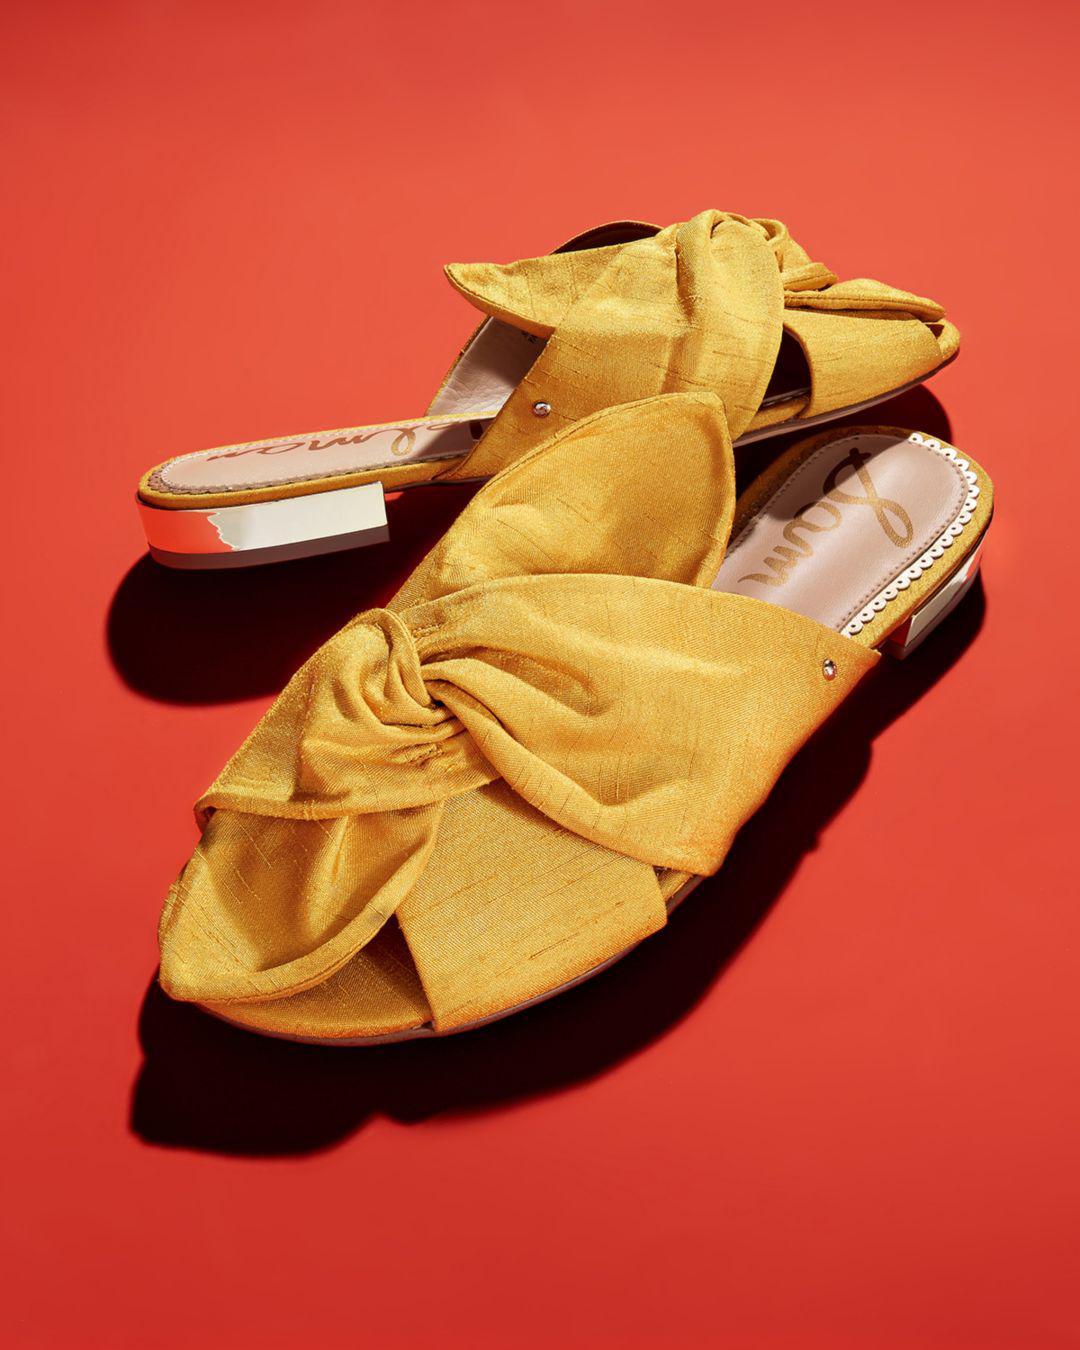 14b0779e4e57 Sam Edelman Women s Darian Knotted Silk Slide Sandals in Yellow - Lyst